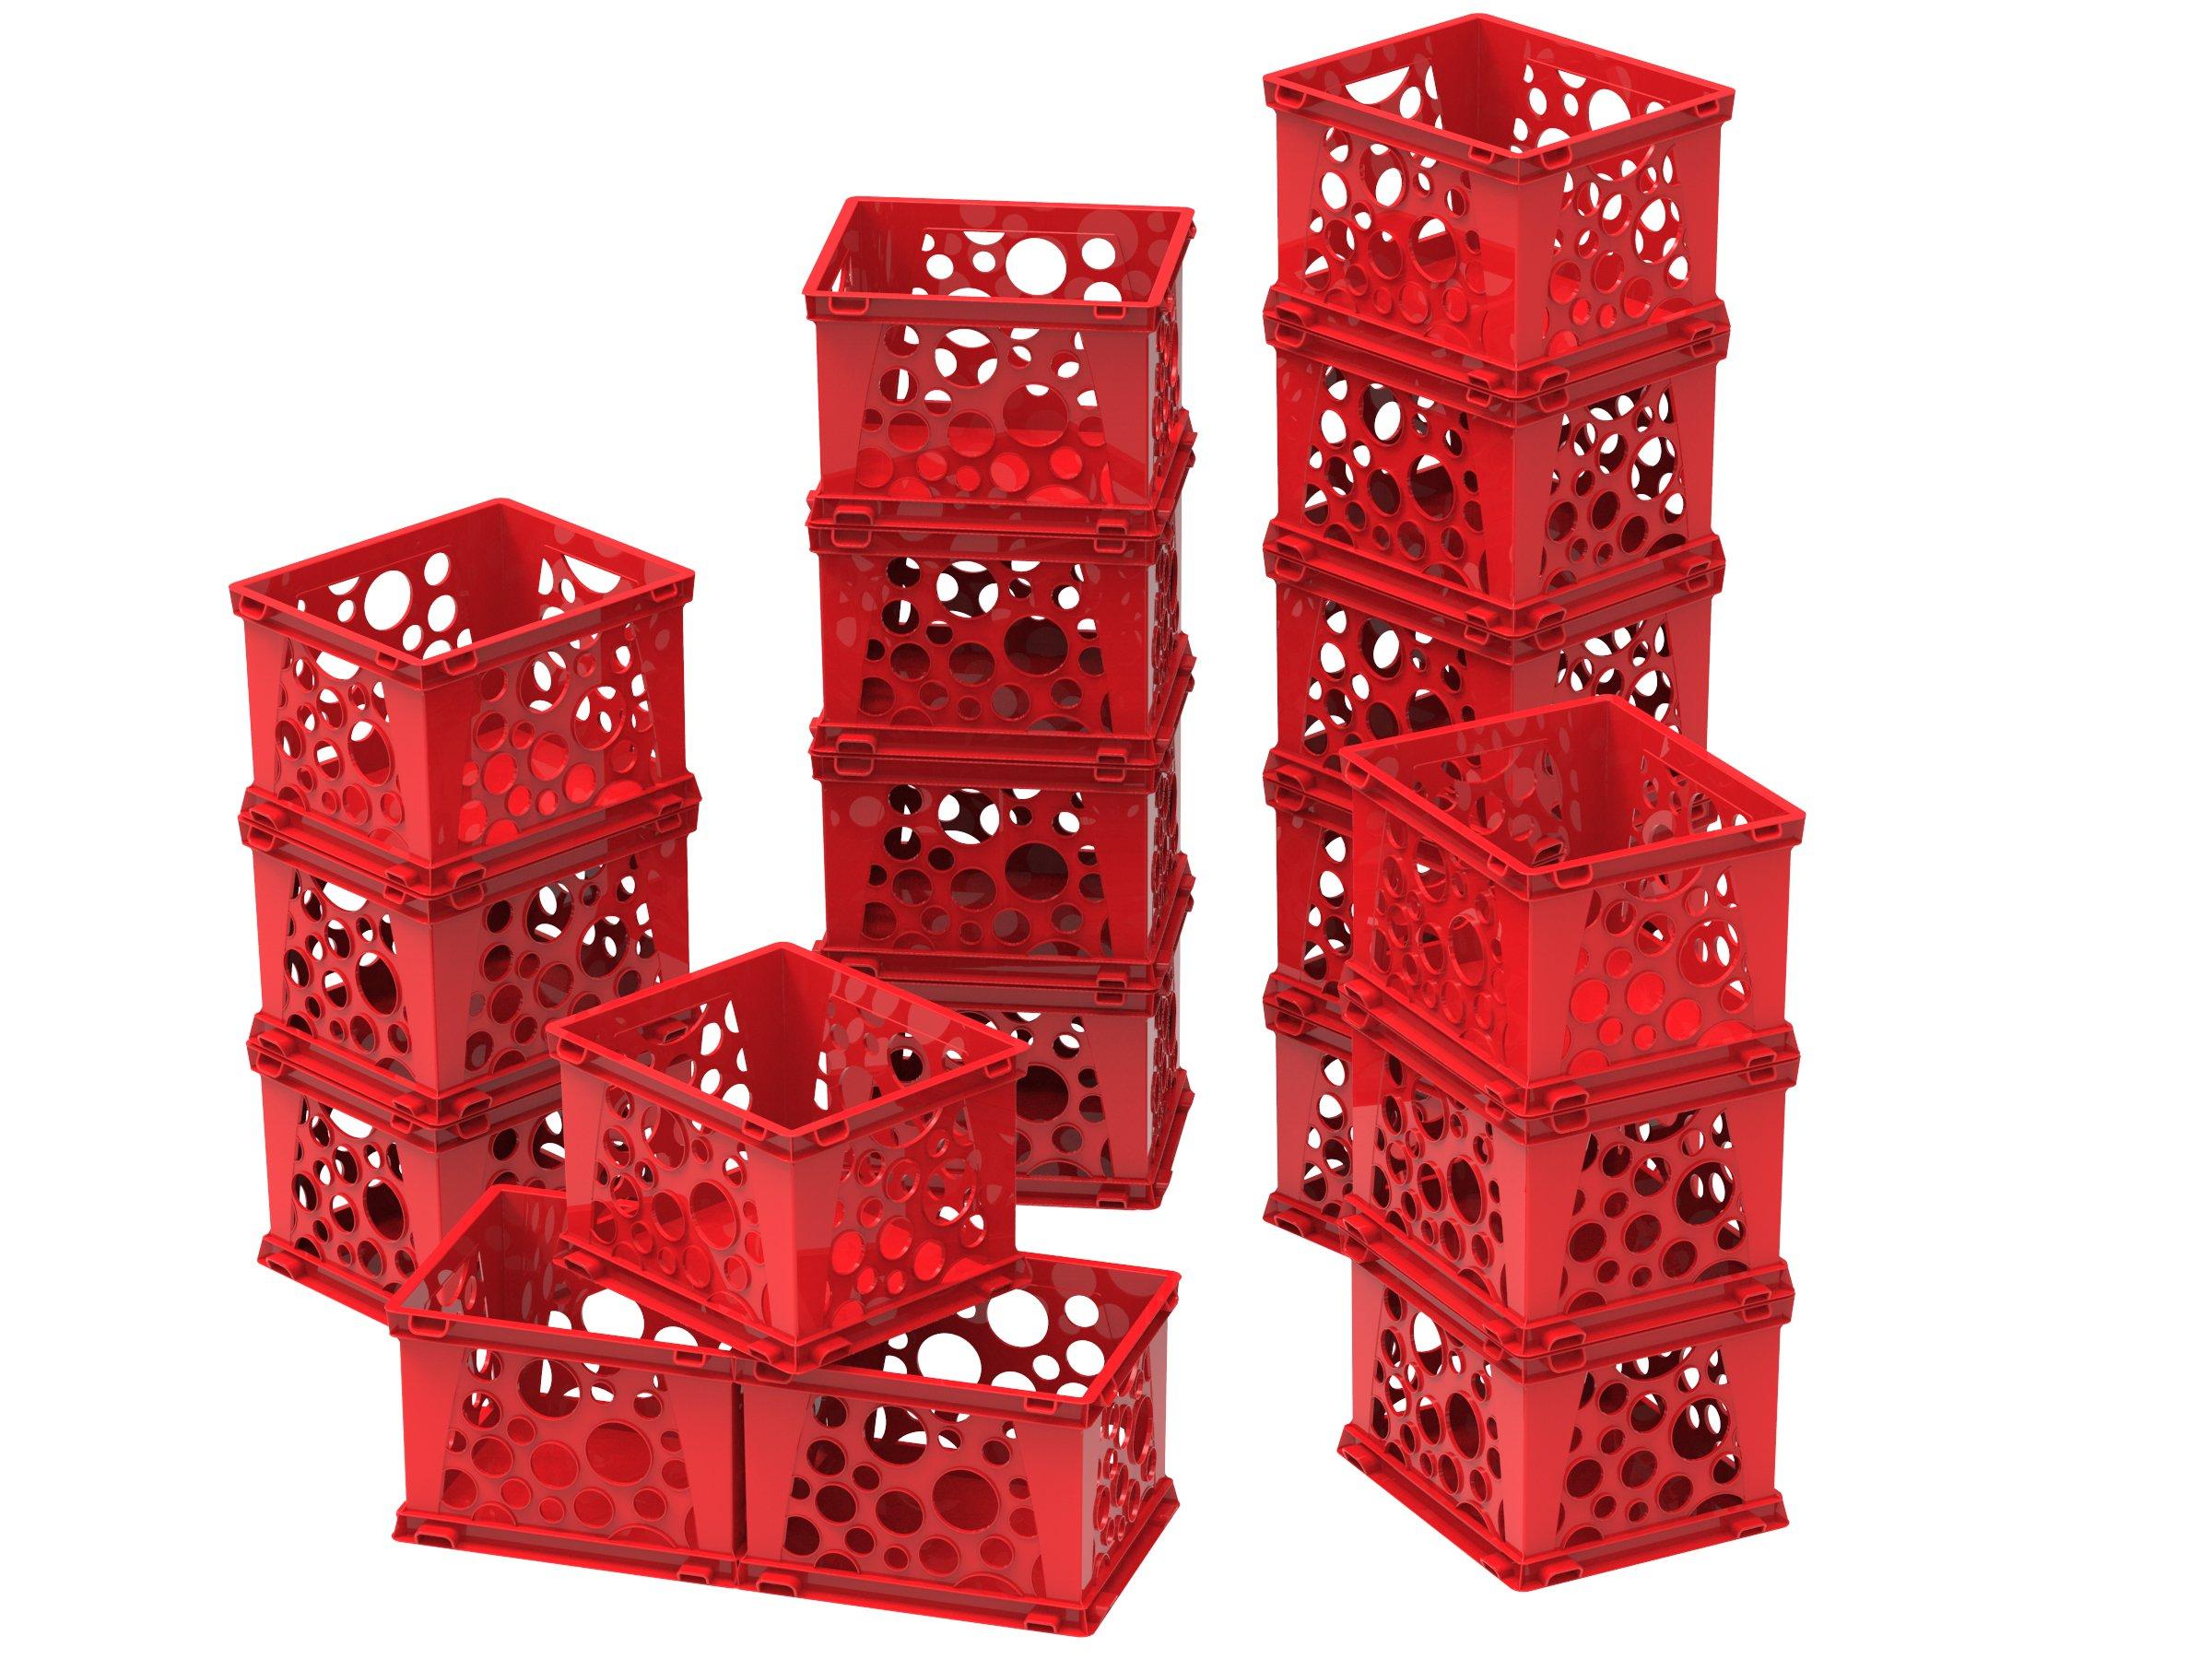 Storex Micro Crate, 6.75 x 5.8 x 4.8'', Red, Case of 18 (63103U18C) by Storex